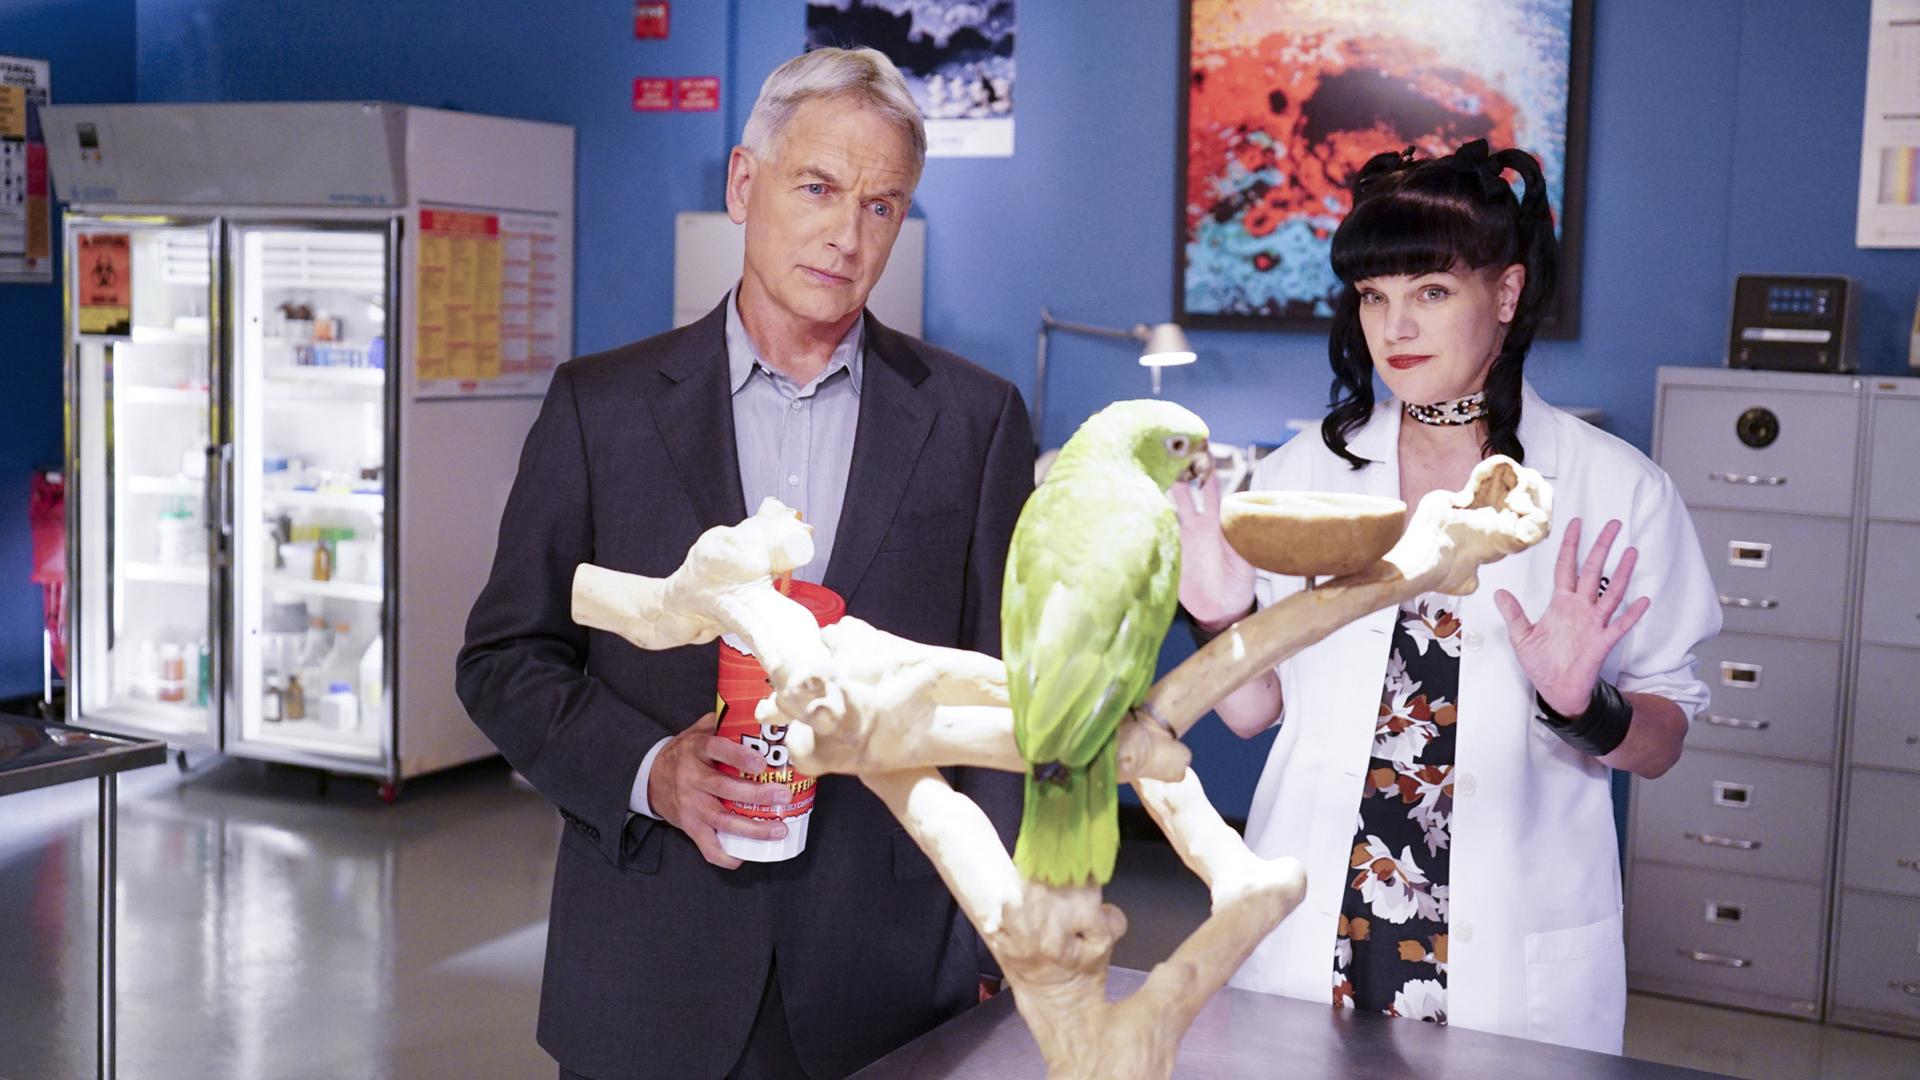 Gibbs meets Abby's new lab partner, Juan.